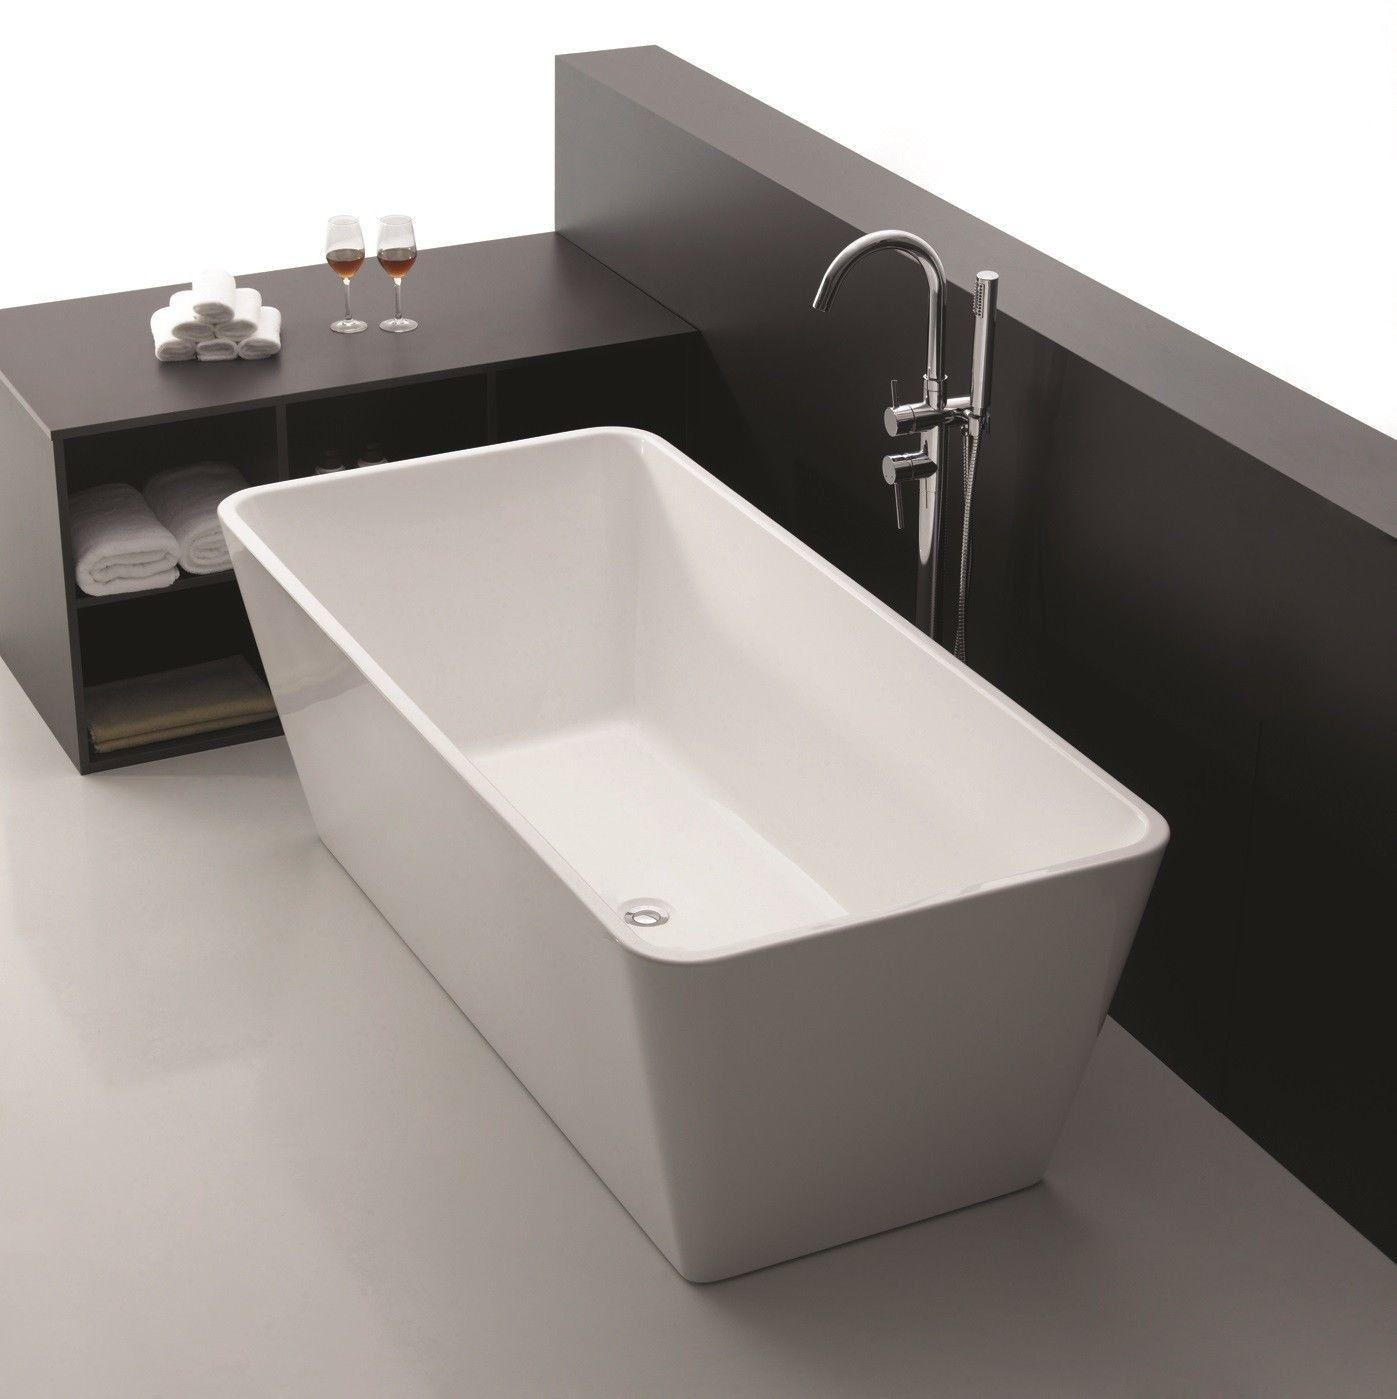 Elouera square freestanding lucite acrylic bath tub for Acrylic freestanding soaking tub